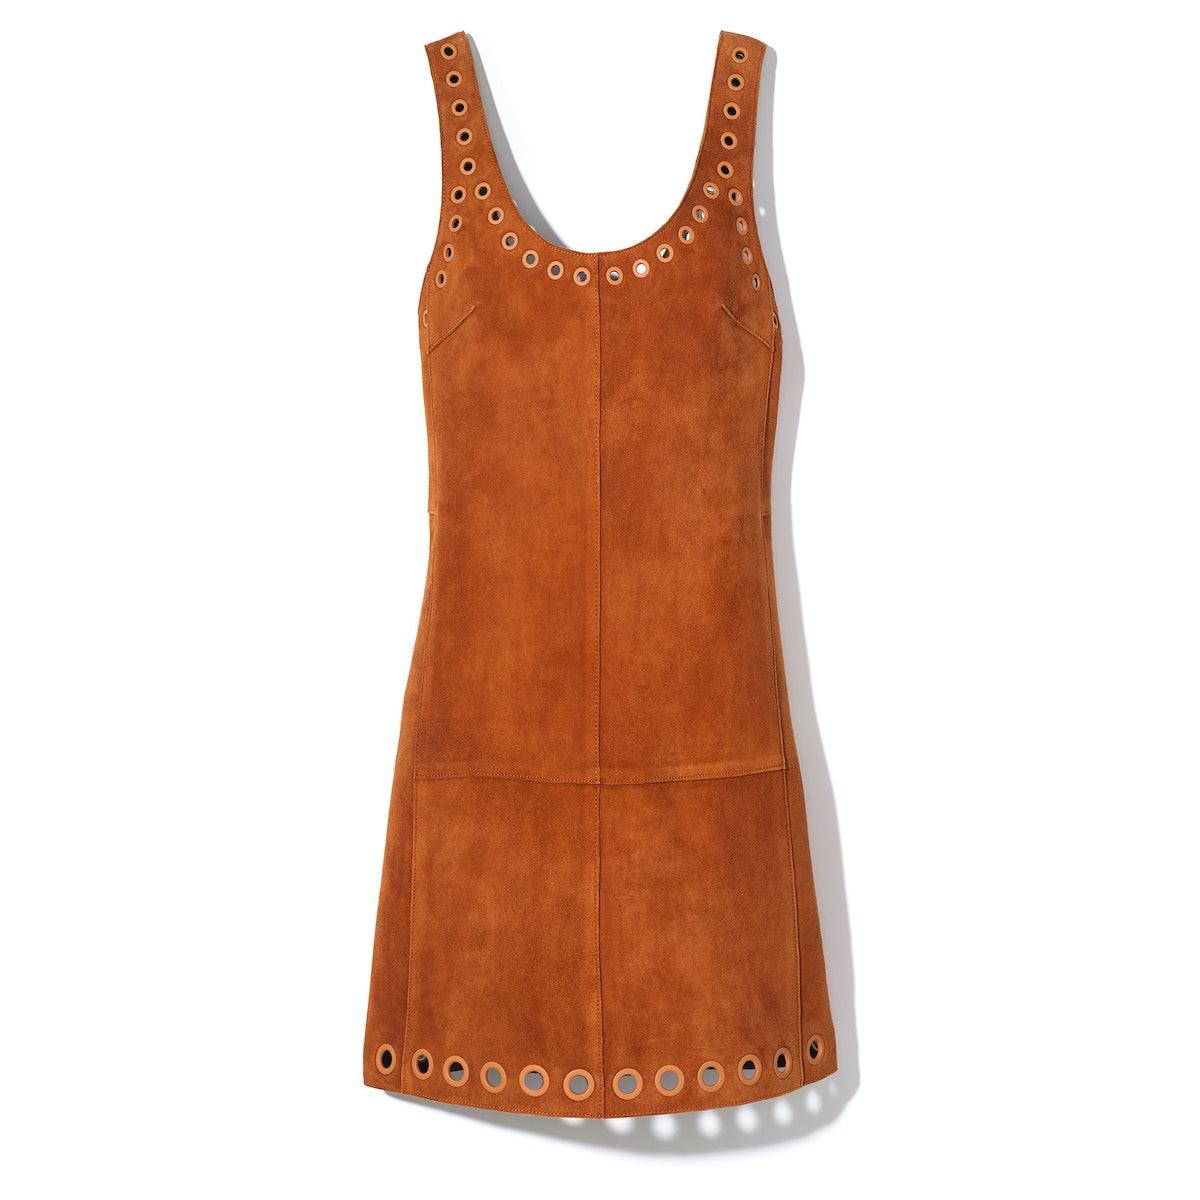 3.1 Phillip Lim dress,